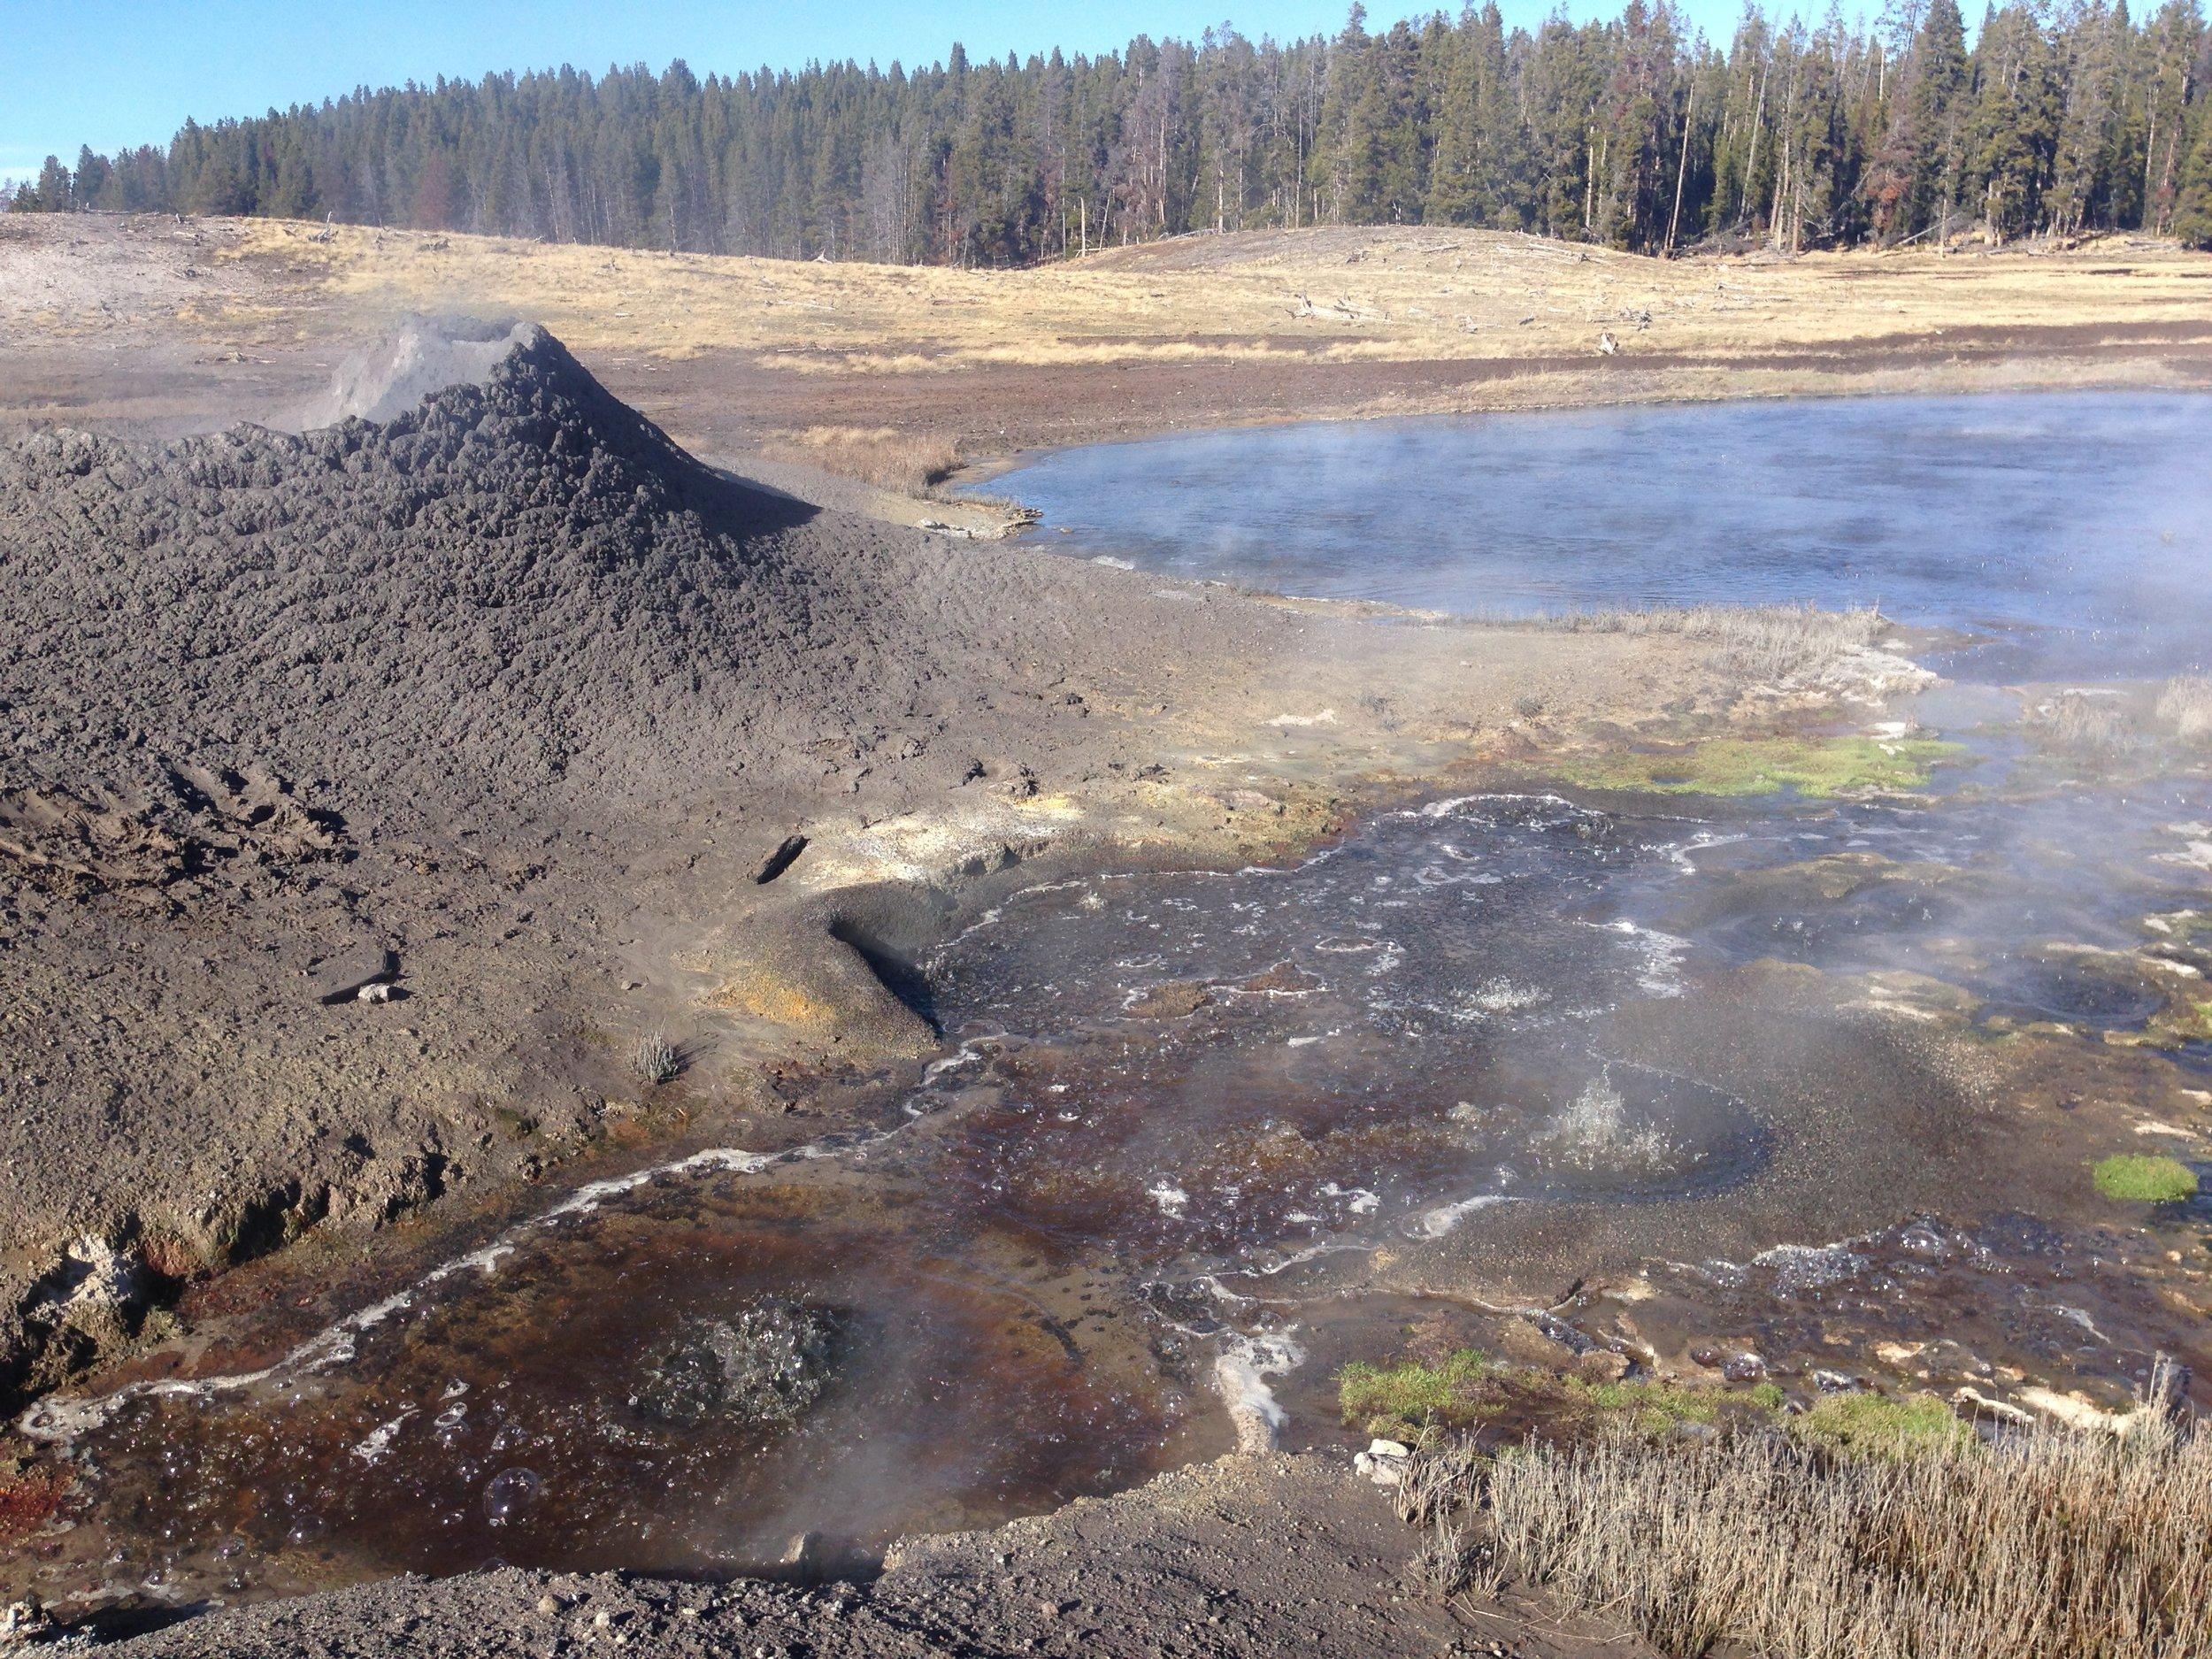 Obsidian Pool again